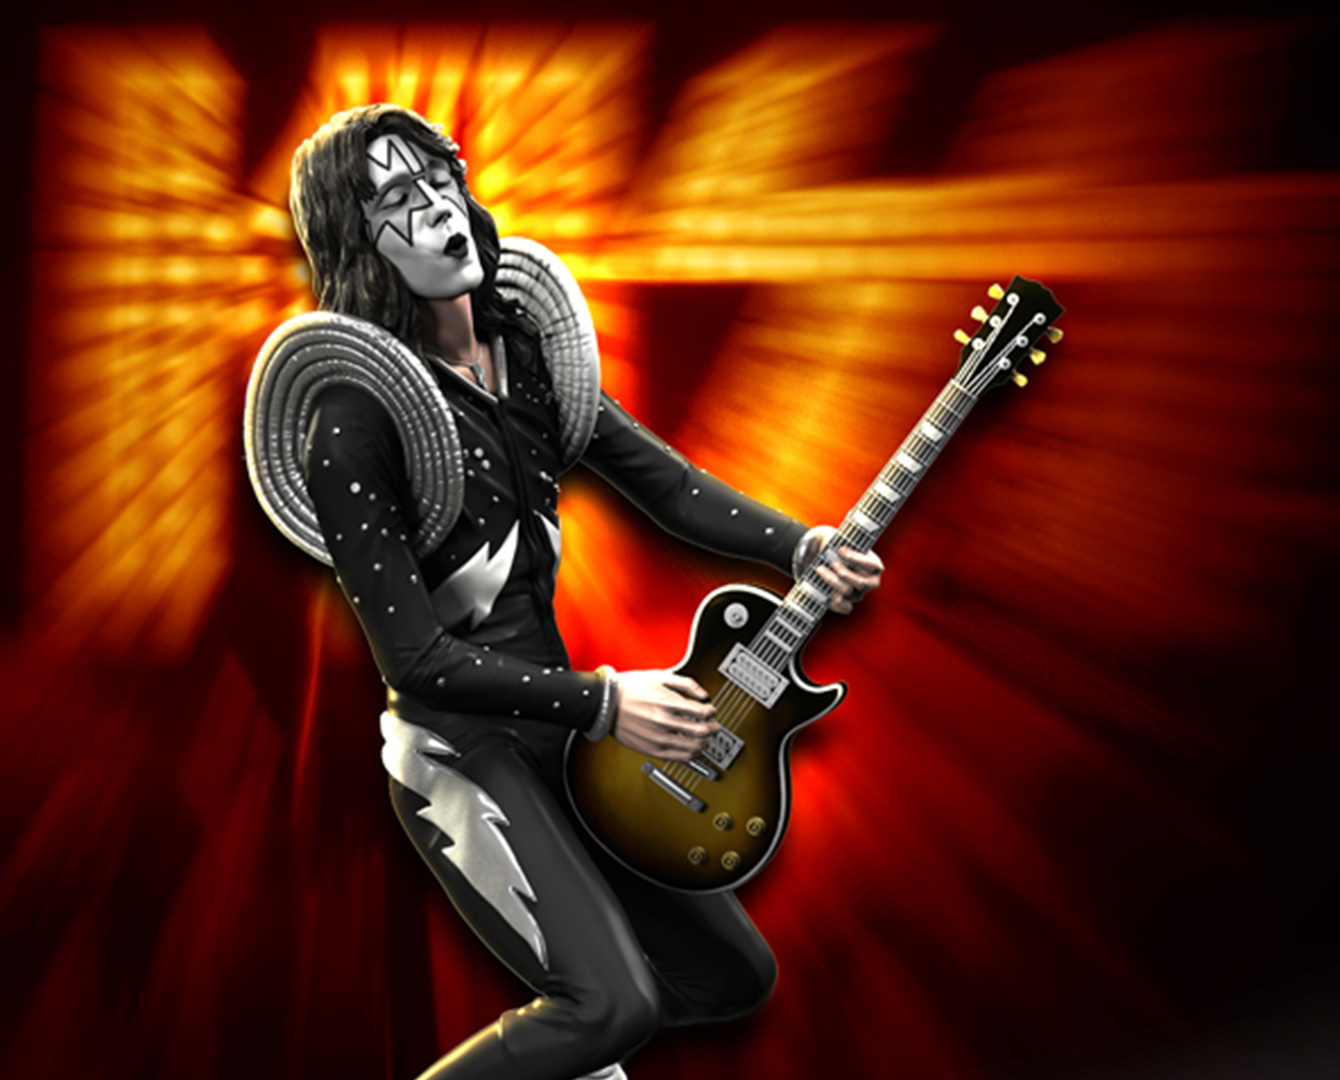 Kiss The Spaceman Alive Rock Iconz Knucklebonz Inc